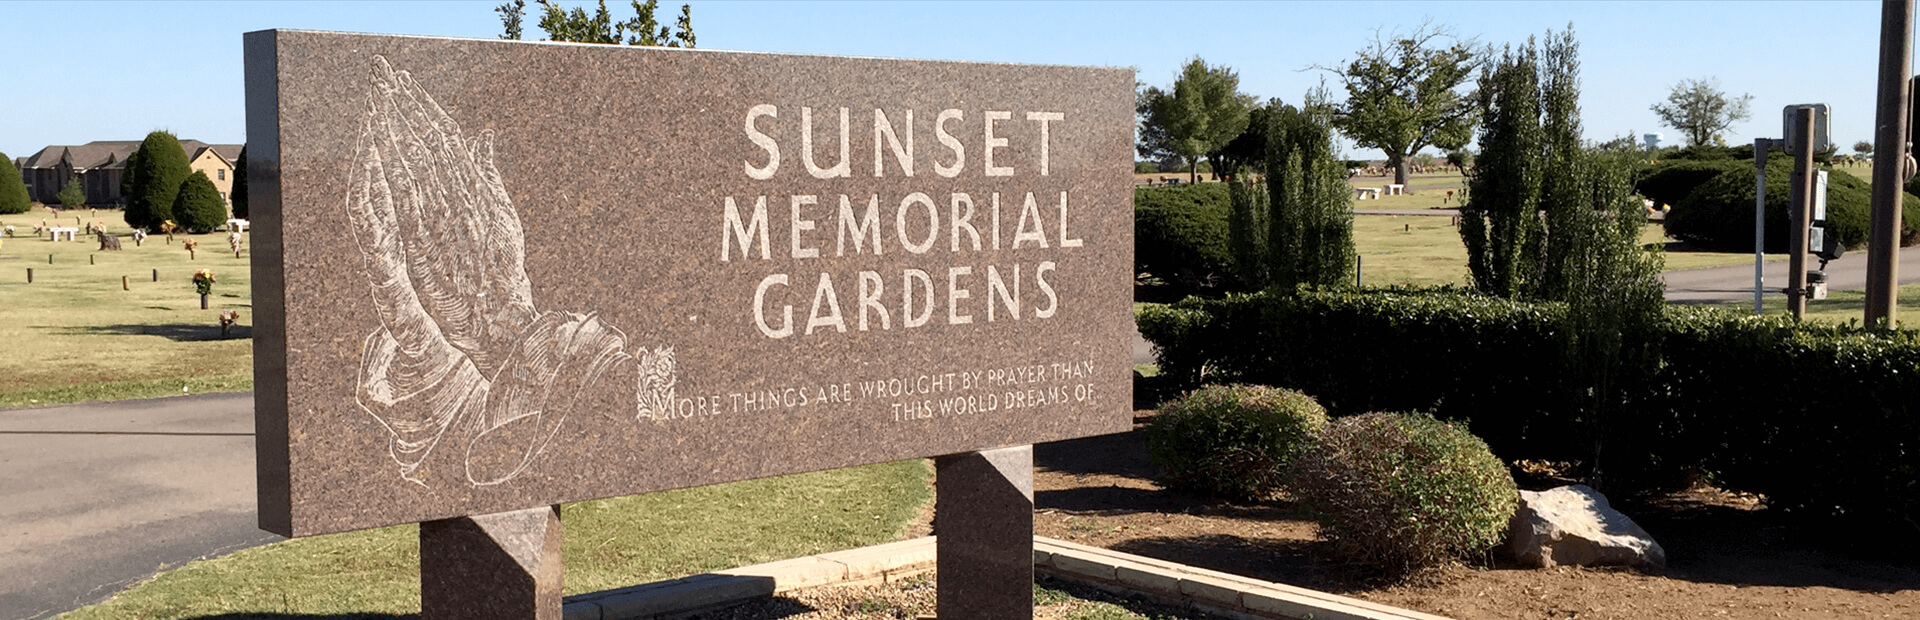 Sunset Memorial Gardens in Lawton, OK